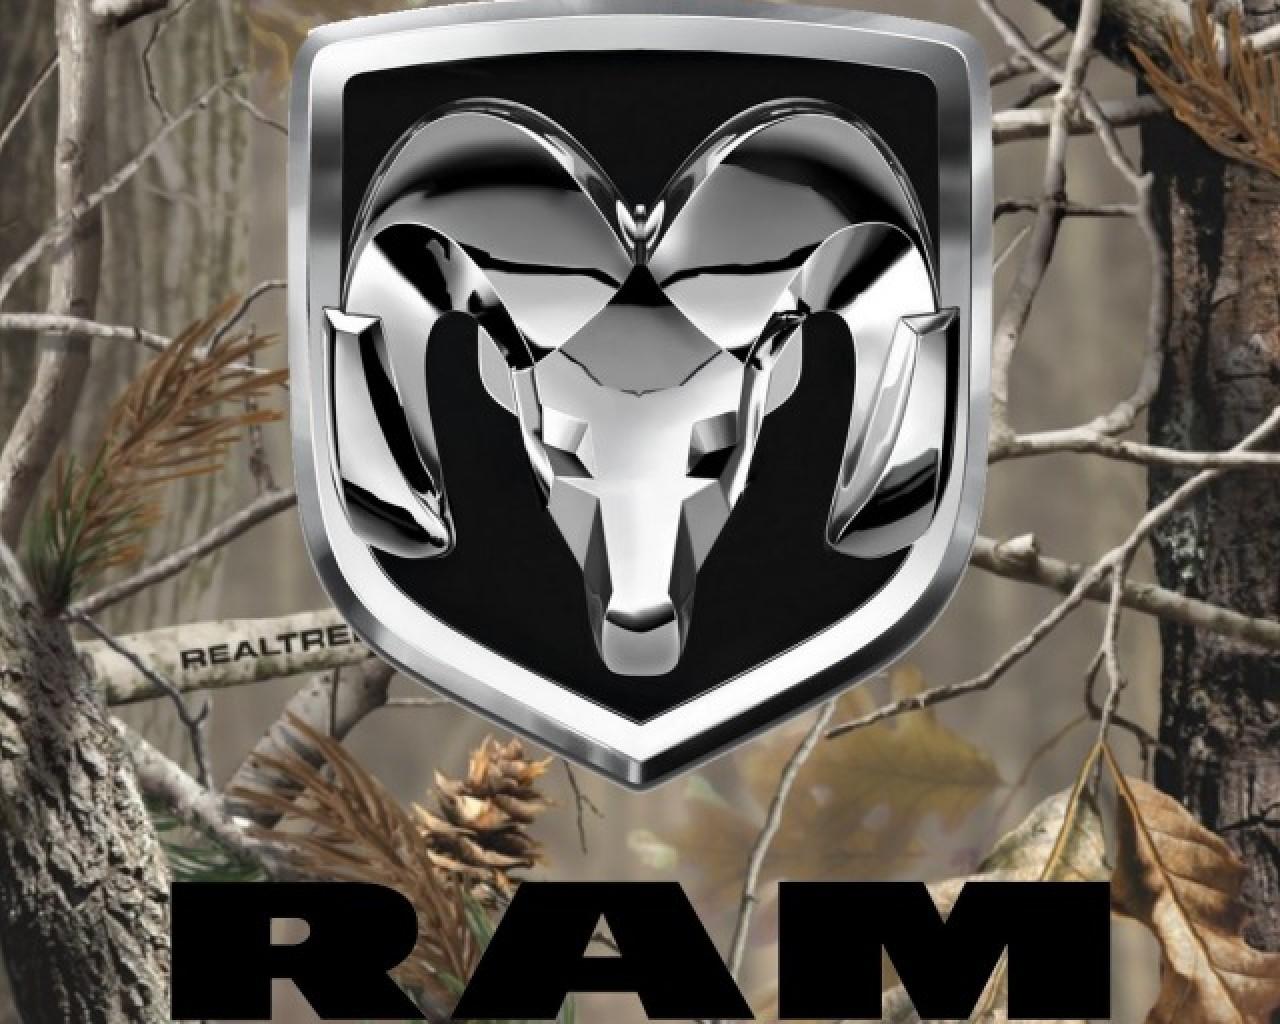 Dodge Ram Logo Camo 1280x1024 Wallpaper Teahub Io